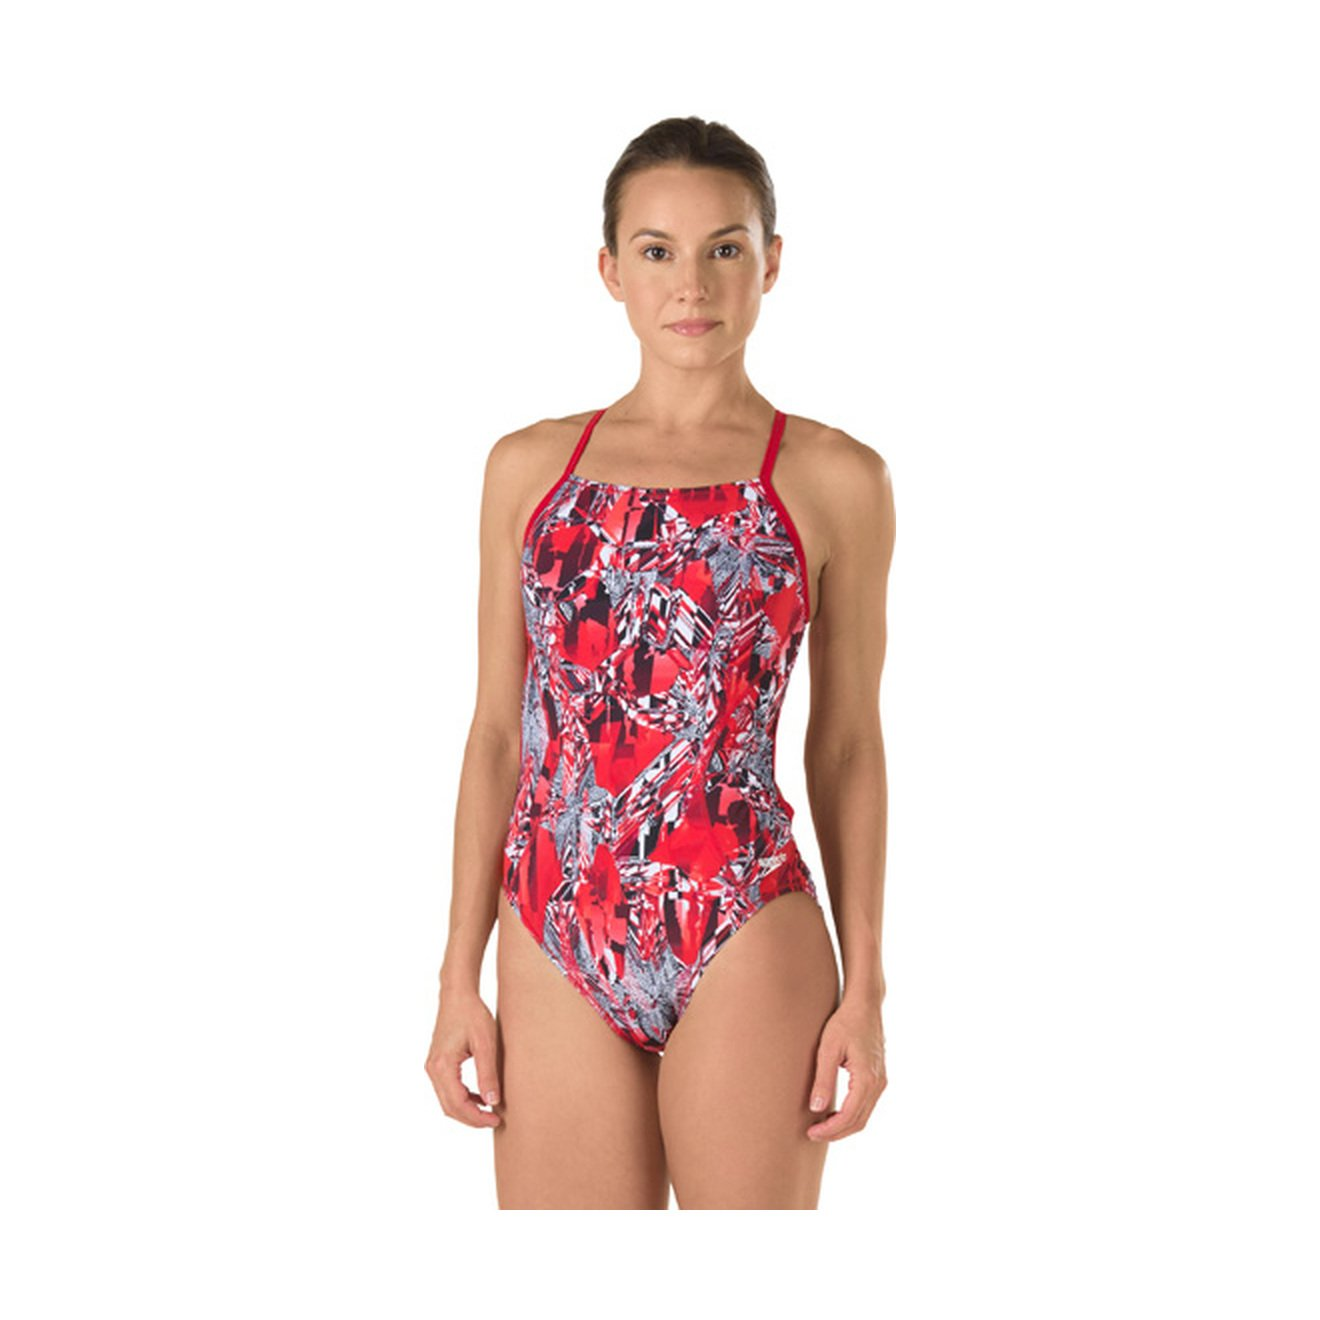 Speedo Big Girls' Youth Solid Splice Cross-Back One-Piece Swimsuit Speedo Girls 7-16 7142072